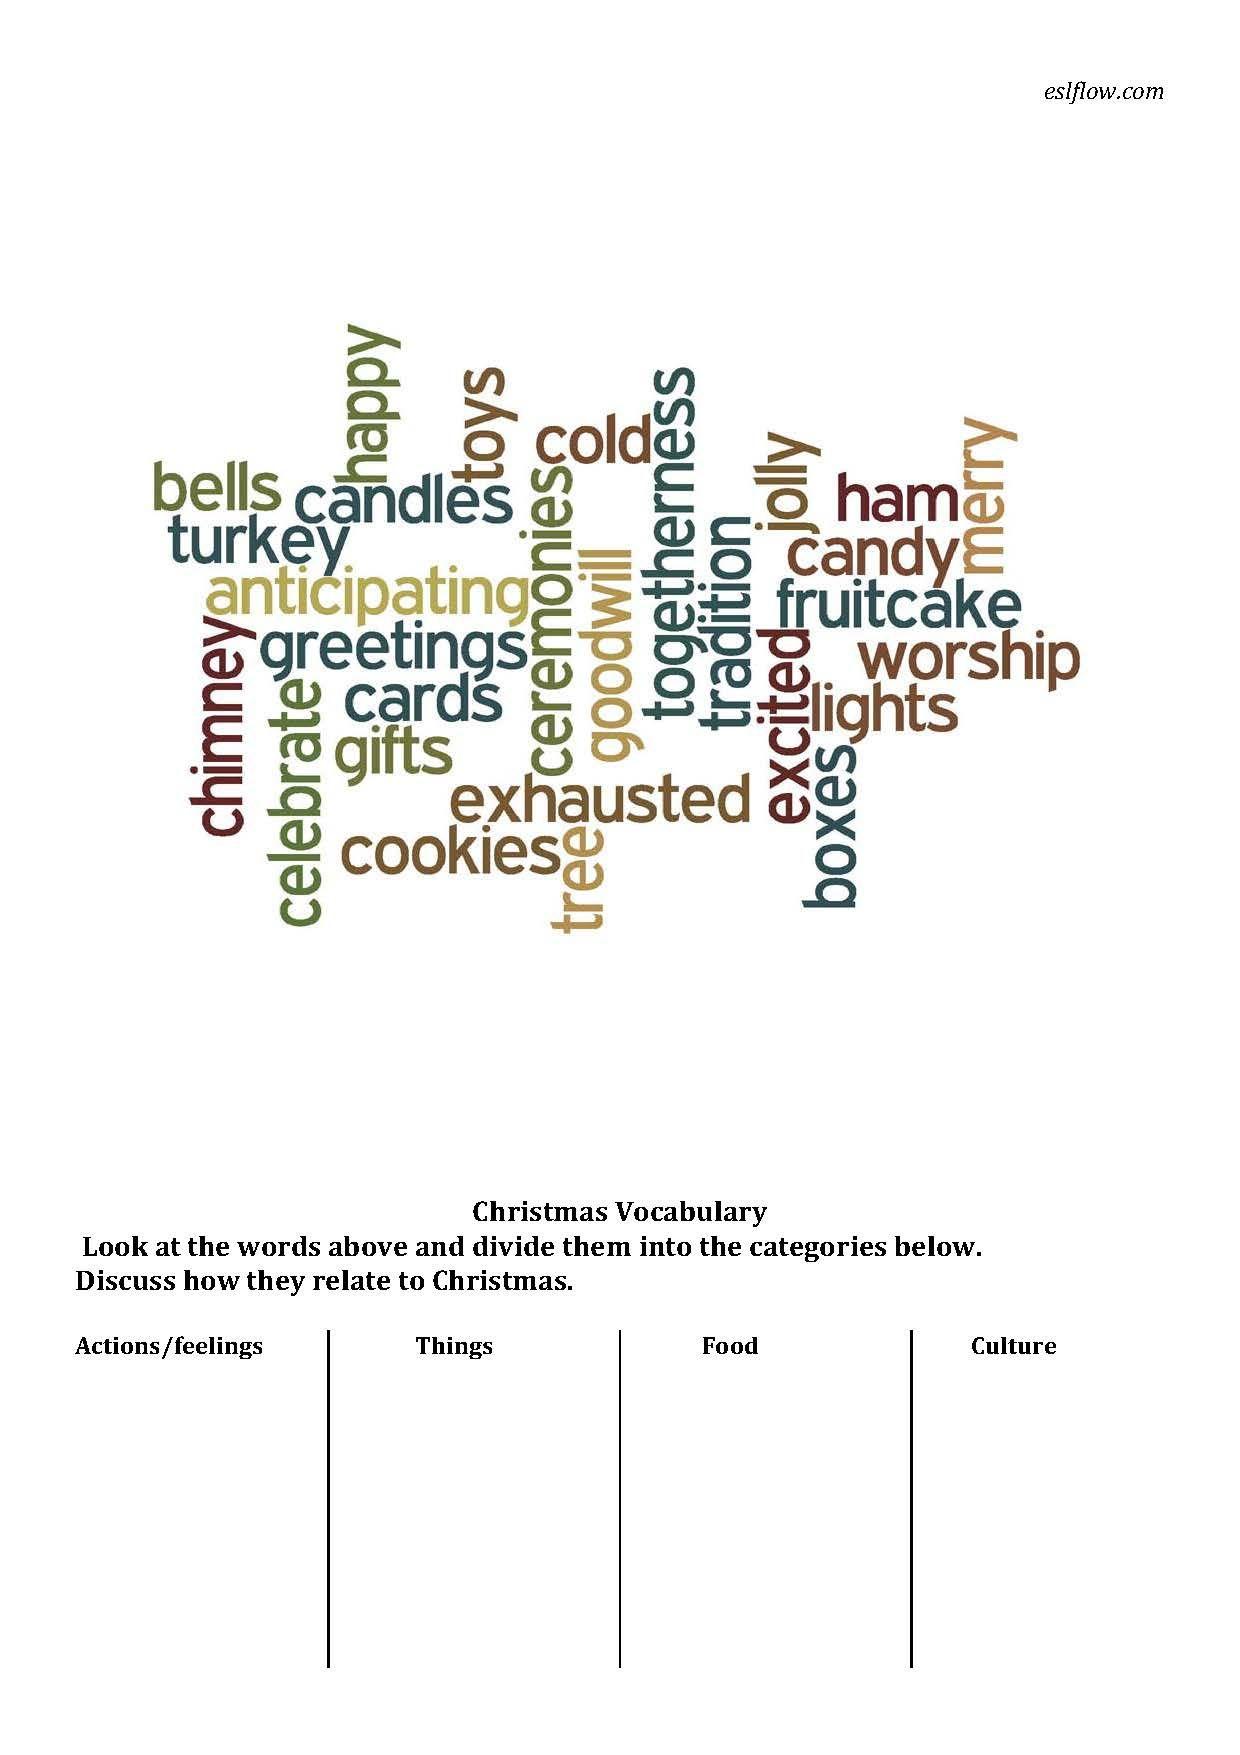 Christmas Vocabulary Sorting Worksheet